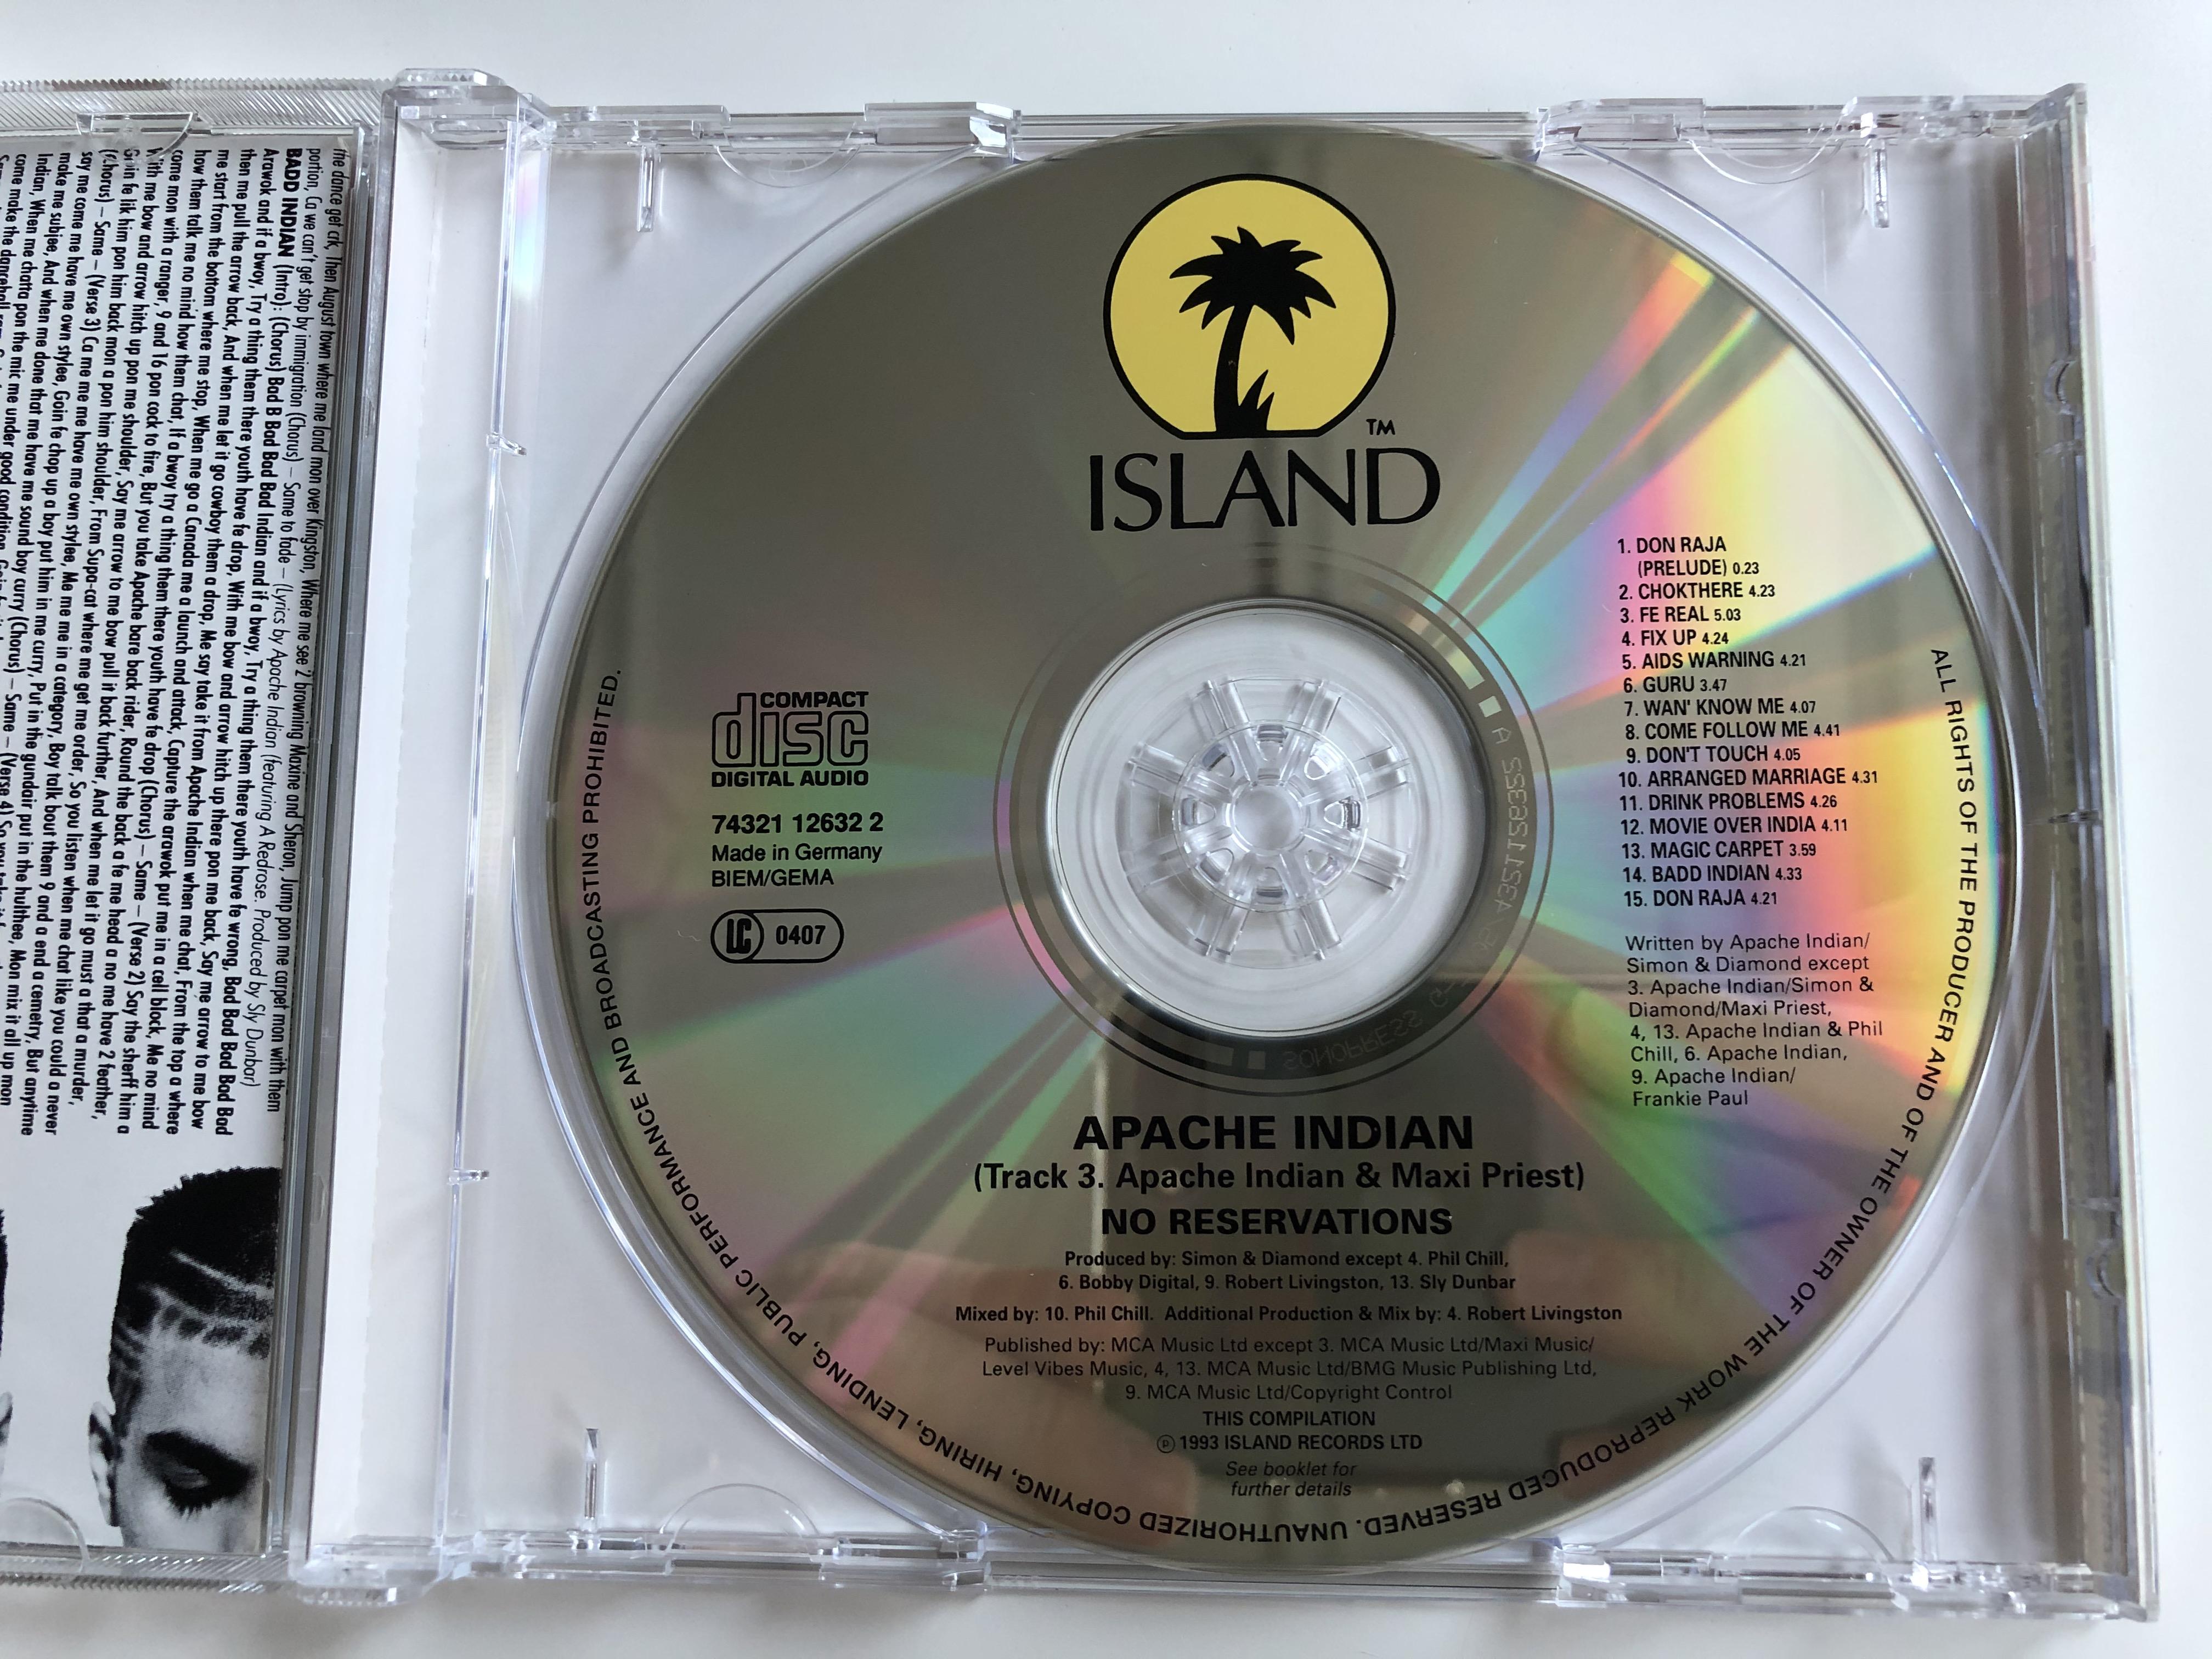 apache-indian-don-raja-no-reservations-island-records-audio-cd-1993-74321-12632-2-3-.jpg